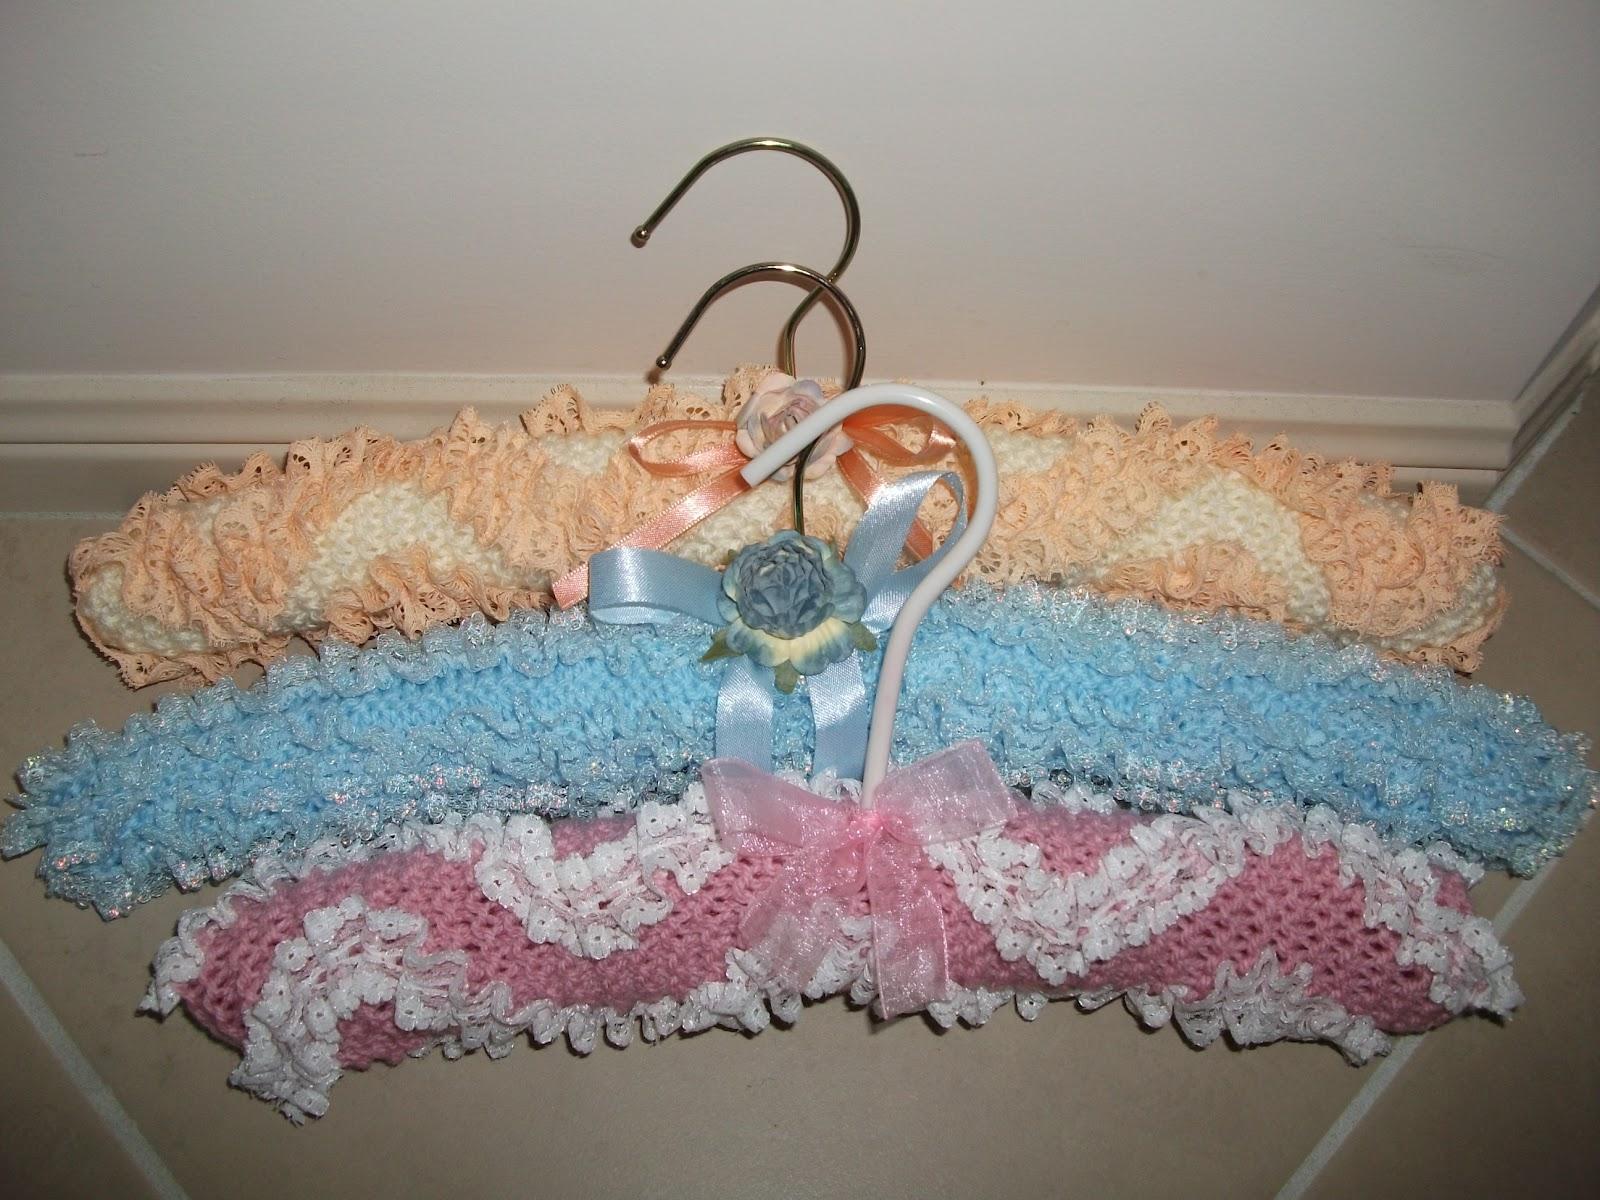 Knitting Coat Hanger Cover Patterns : Krafty kaylee new coathanger cover pattern